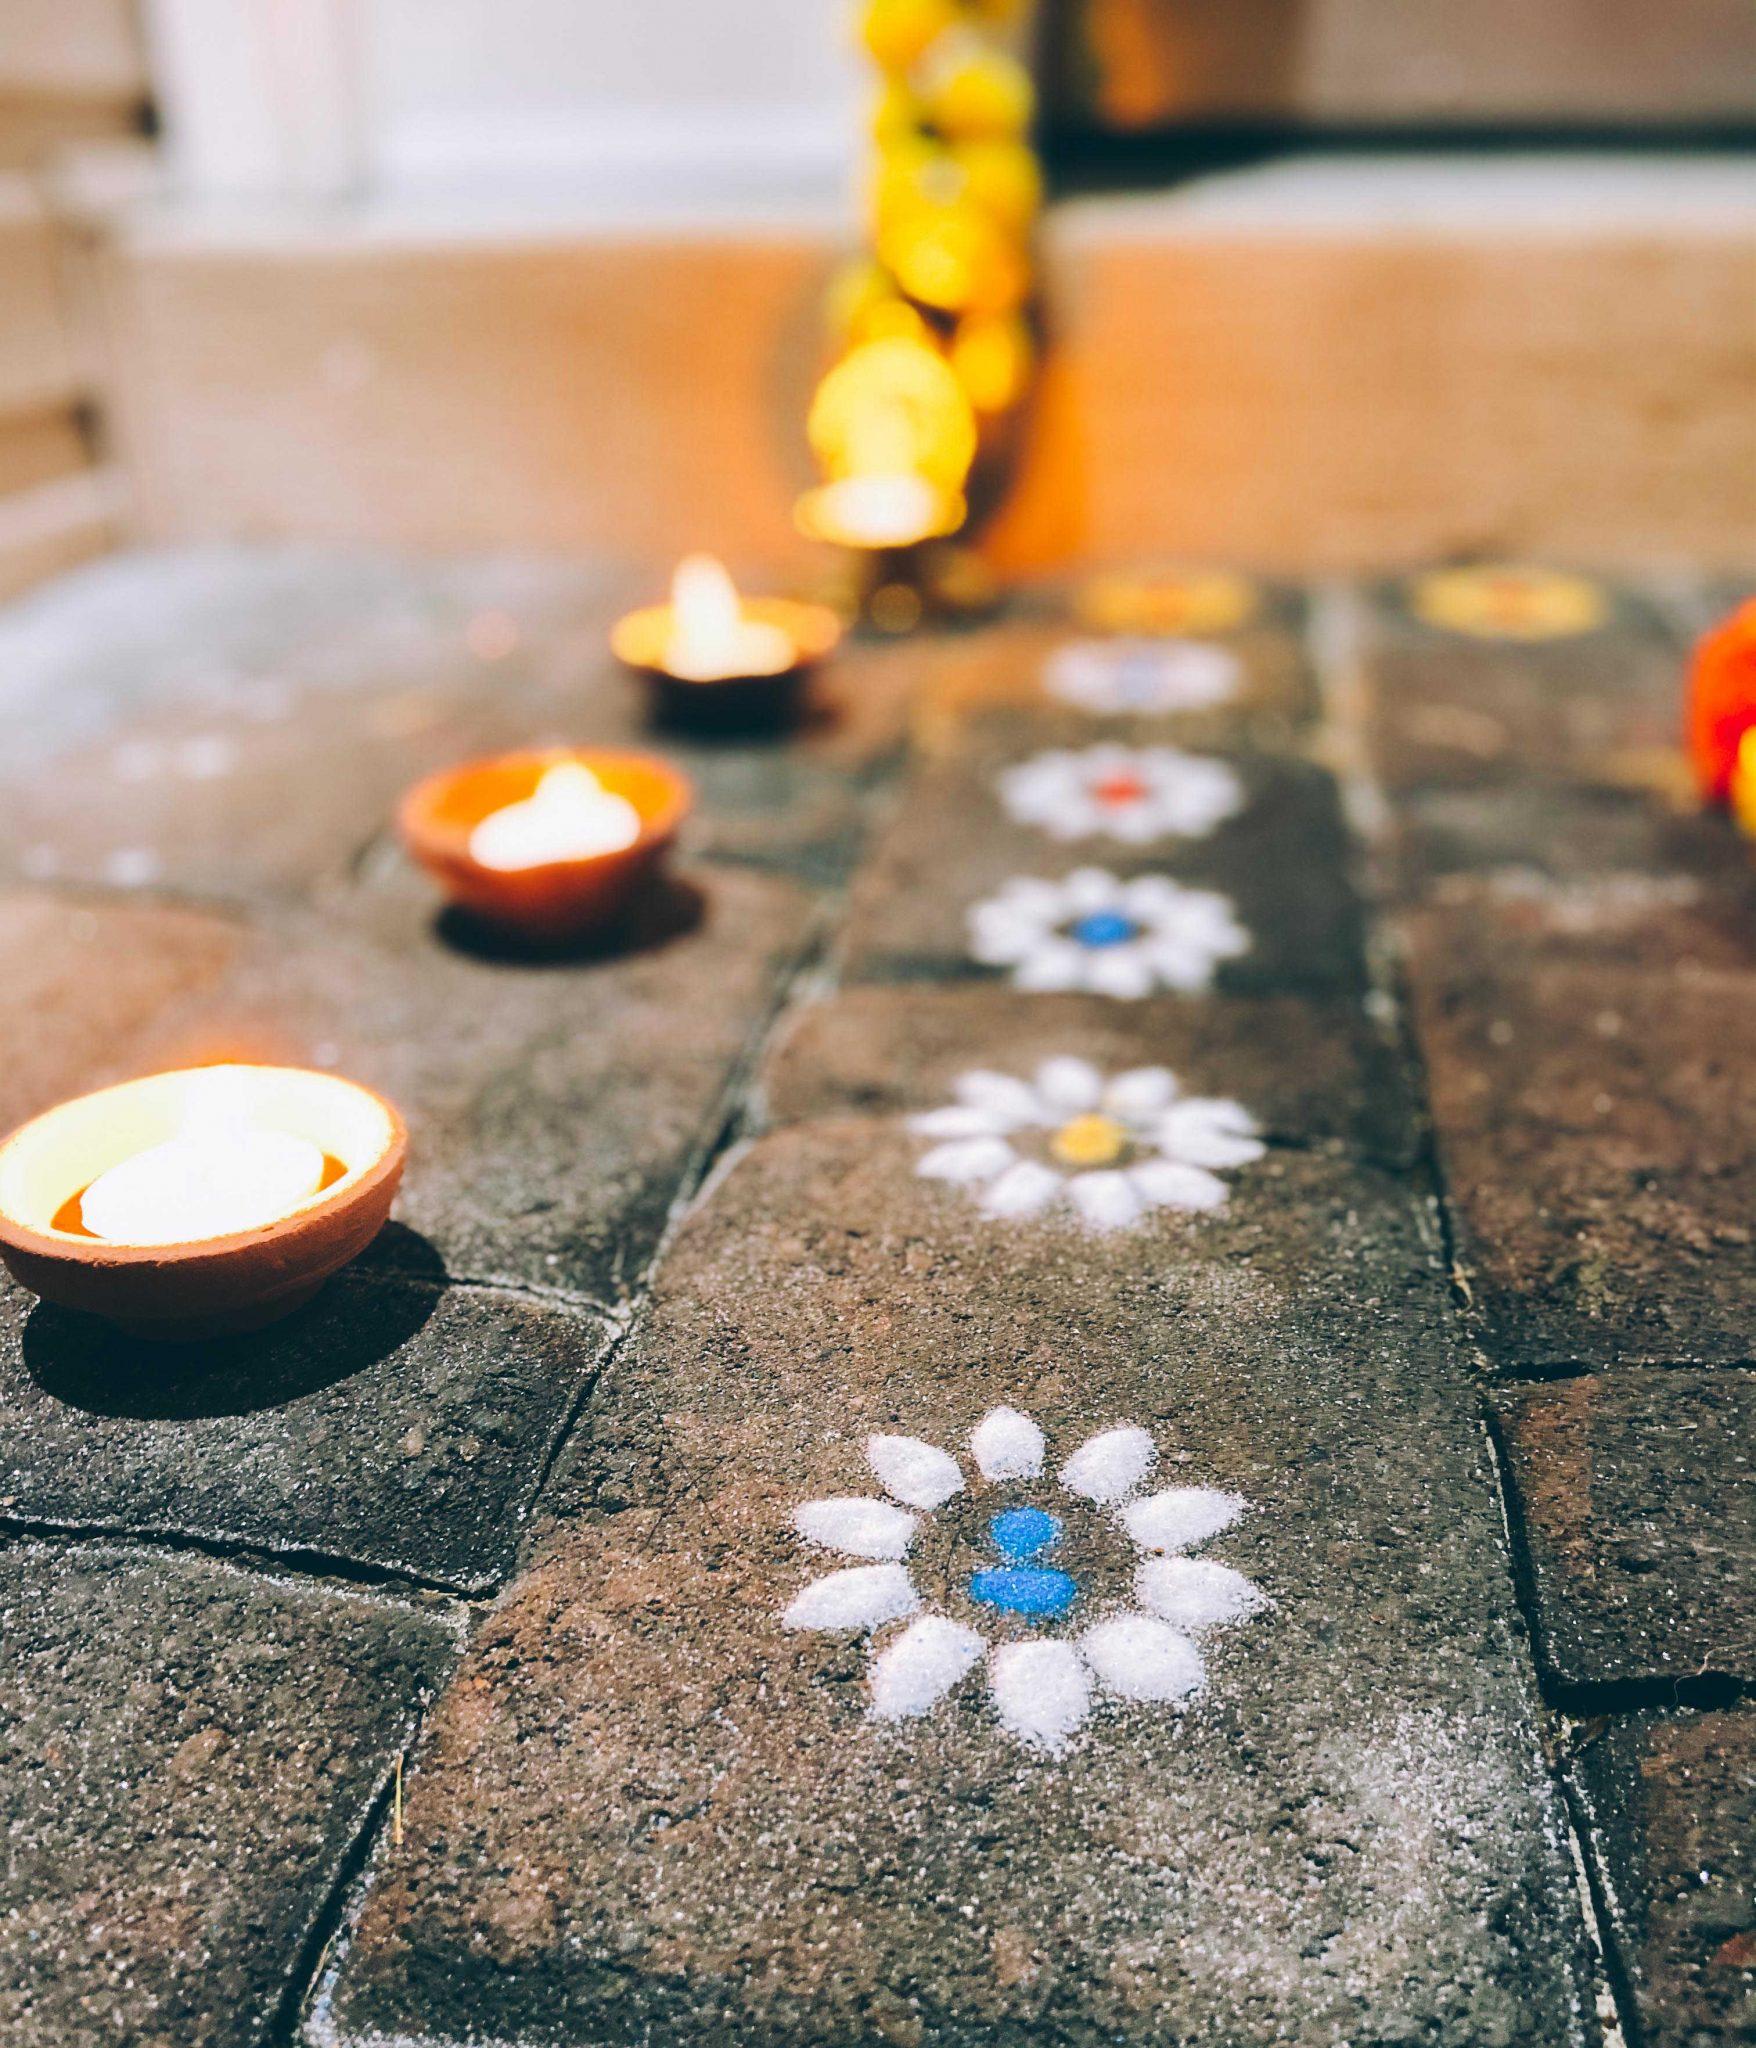 Simple Diwali Decoration ideas featured by top MD lifestyle blogger, Dreaming Loud: Diwali Entrance decoration |Diwali Decoration Ideas: image of a front door and porch decorated with Mango Leaf Toran, Chrysanthemum garlands, Wisteria garlands,Marigold Garlands,Ganesh Diya, Rangoli Stencil, Rangoli Sand Colors, and Clay diyas.